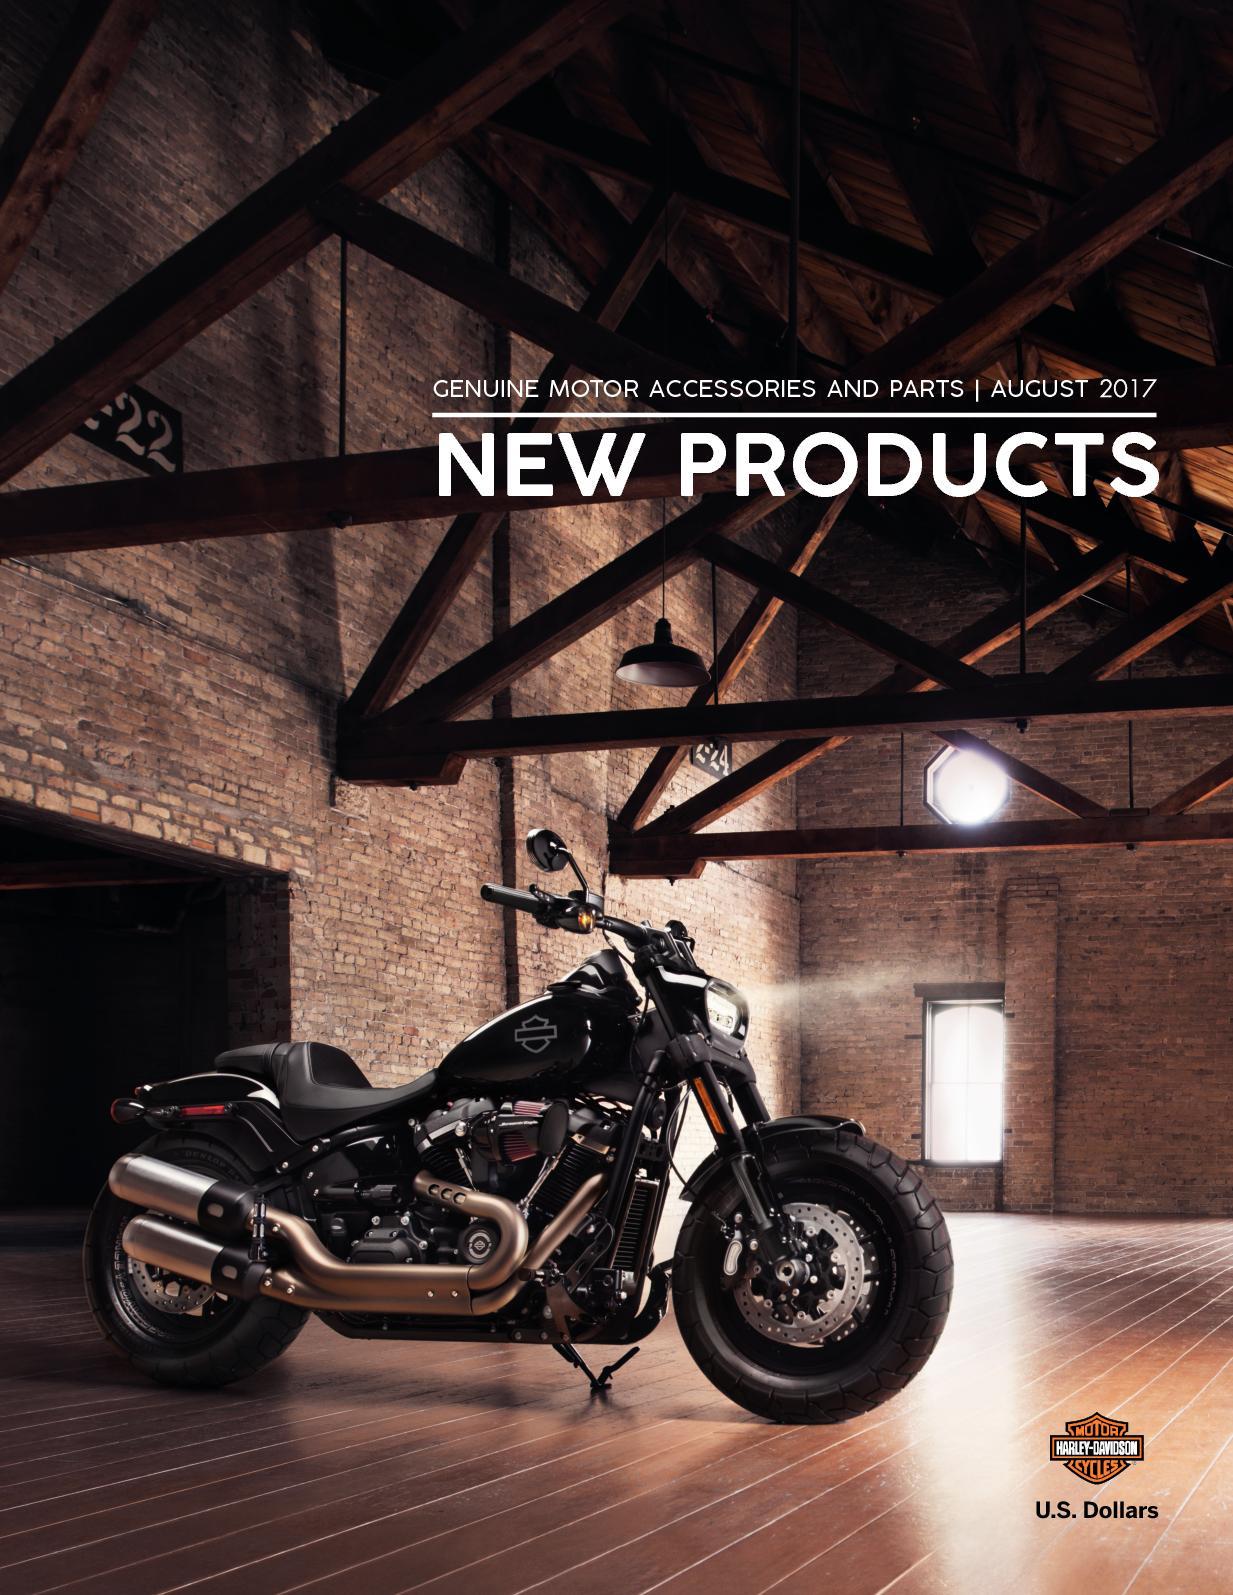 Calamo 2018 Pa New Products Catalog Harley Davidson Leather Protectant